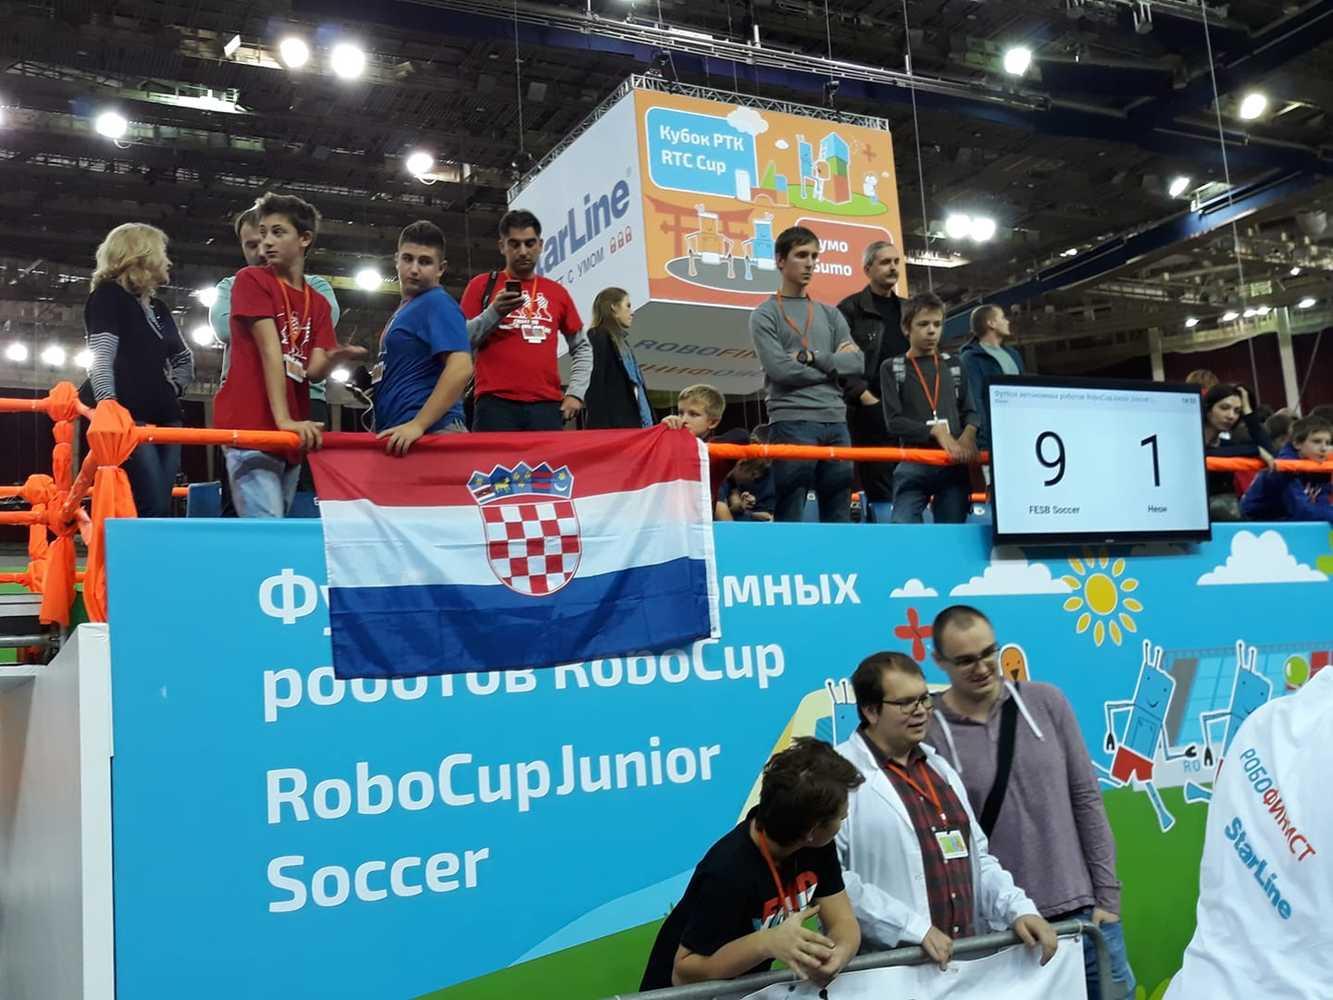 #1 mjesto KATEGORIJA SOCCER LIGHT WEIGHT  ekipa  FESB Soccer | Darijan GUDELJ, Alan SLADOJEVIĆ, Paško ZEKIĆ i Antonio NIKOLIĆ | mentor Toni JAGNJIĆ